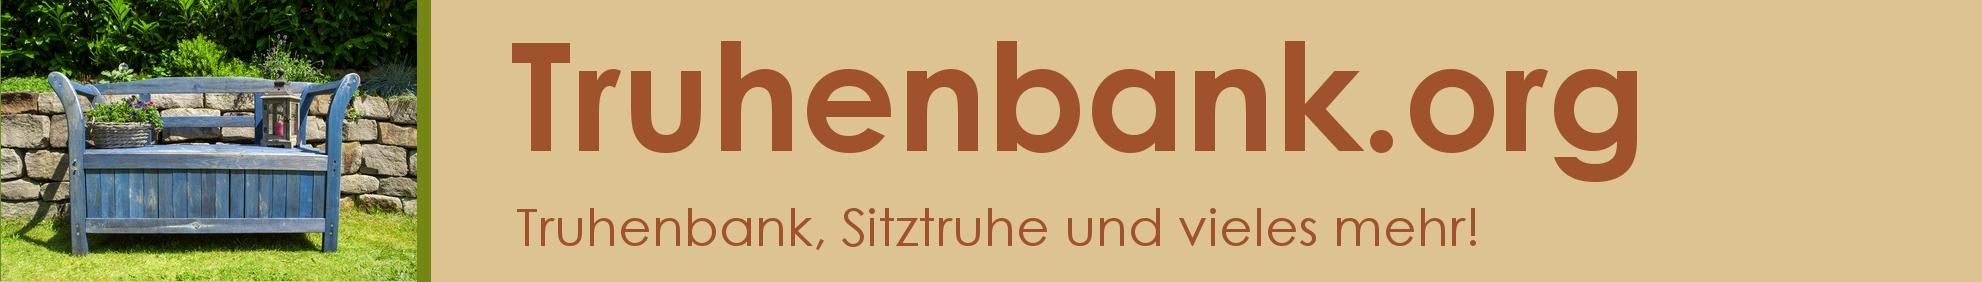 Truhenbank